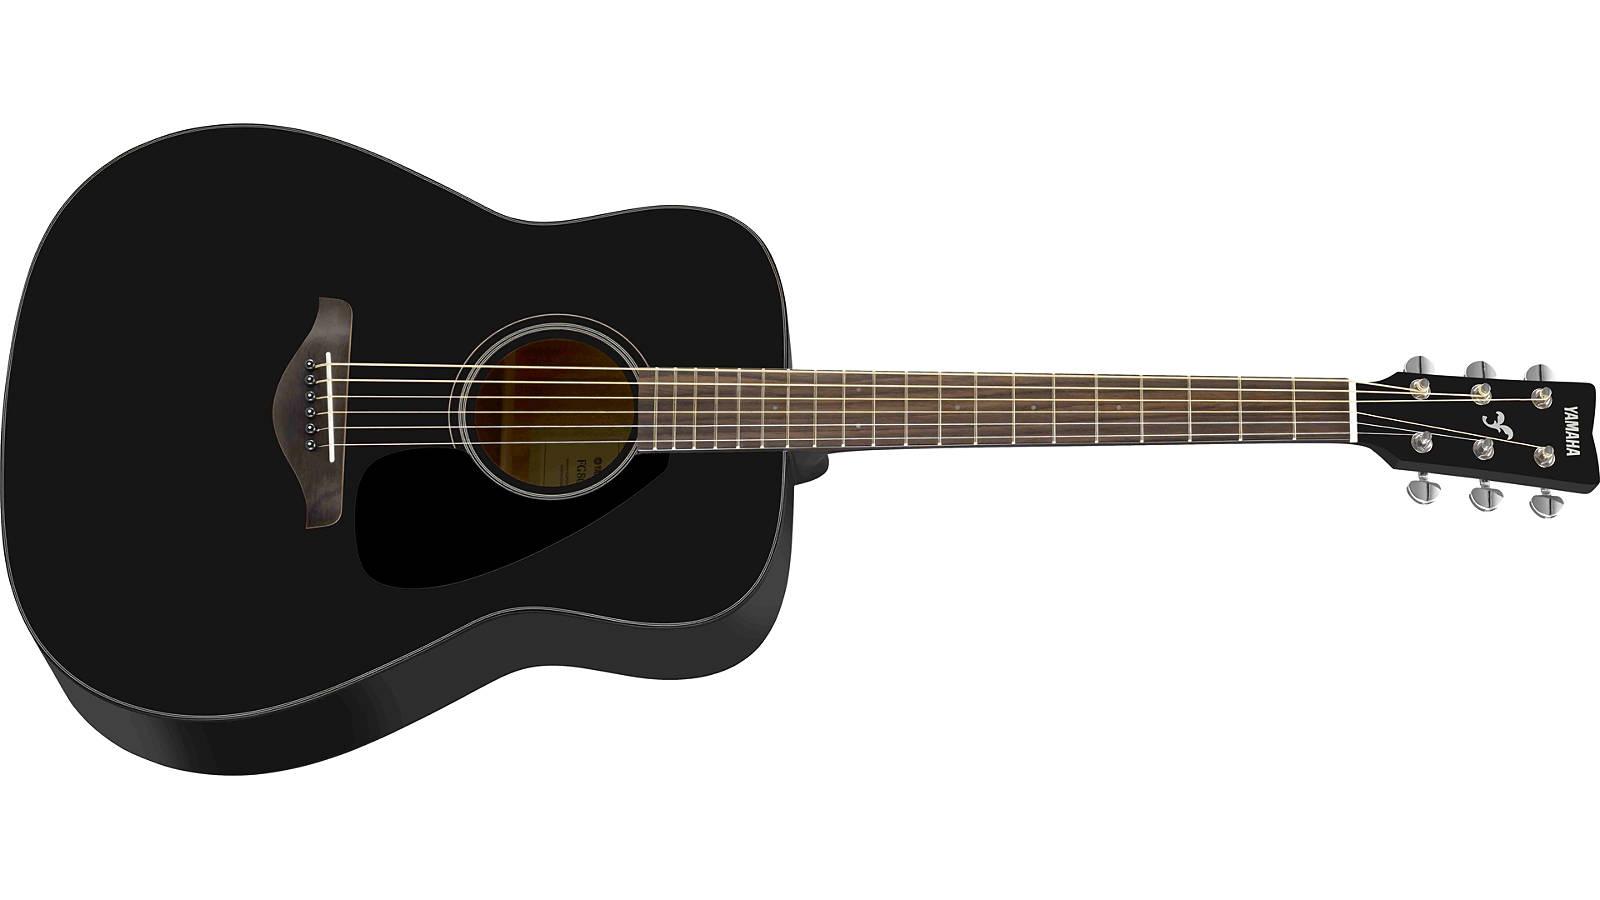 Yamaha FG800 BL Westerngitarre Black